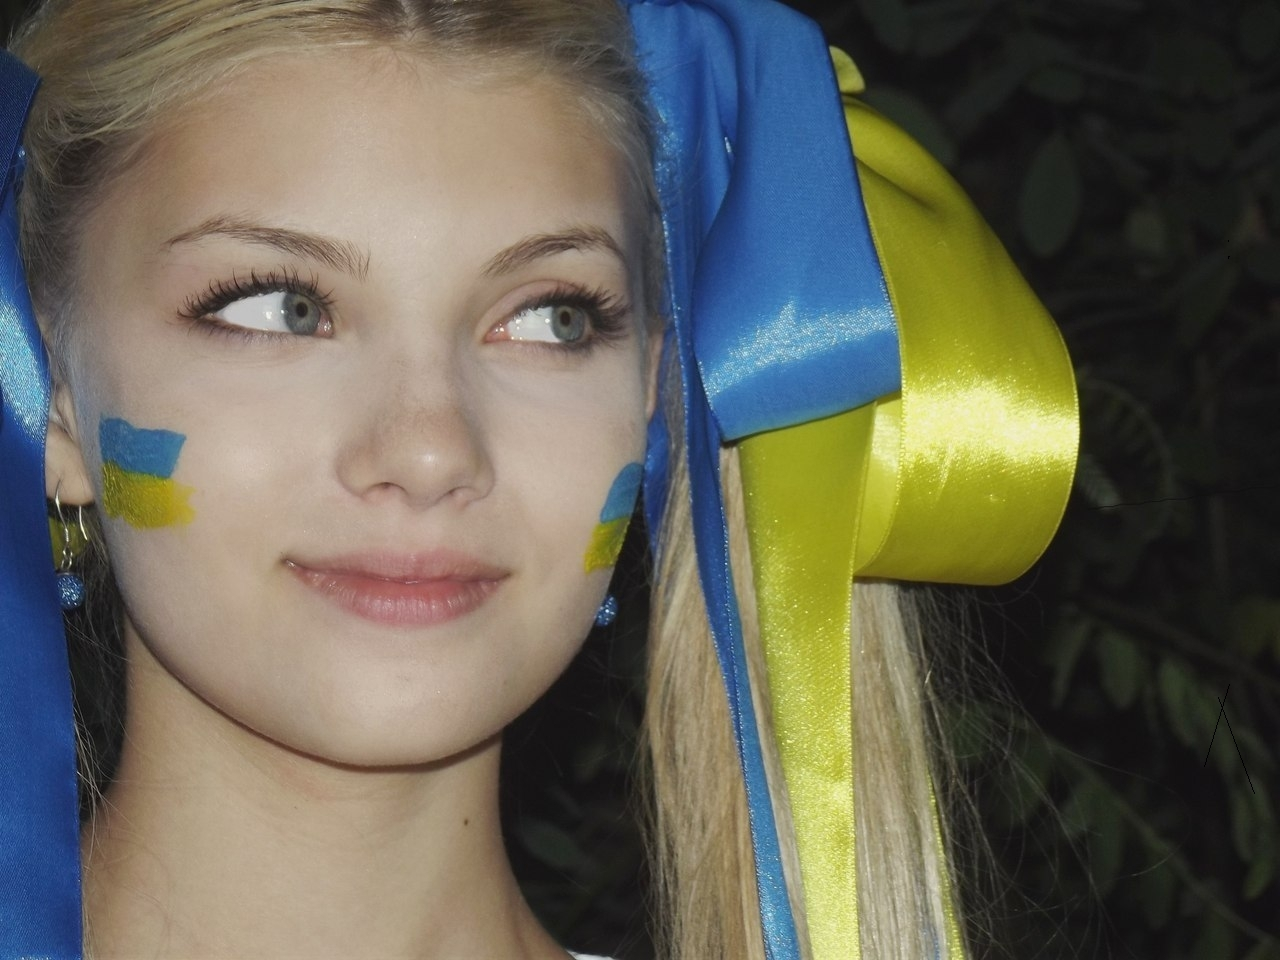 Секс девочки украинки 17 фотография